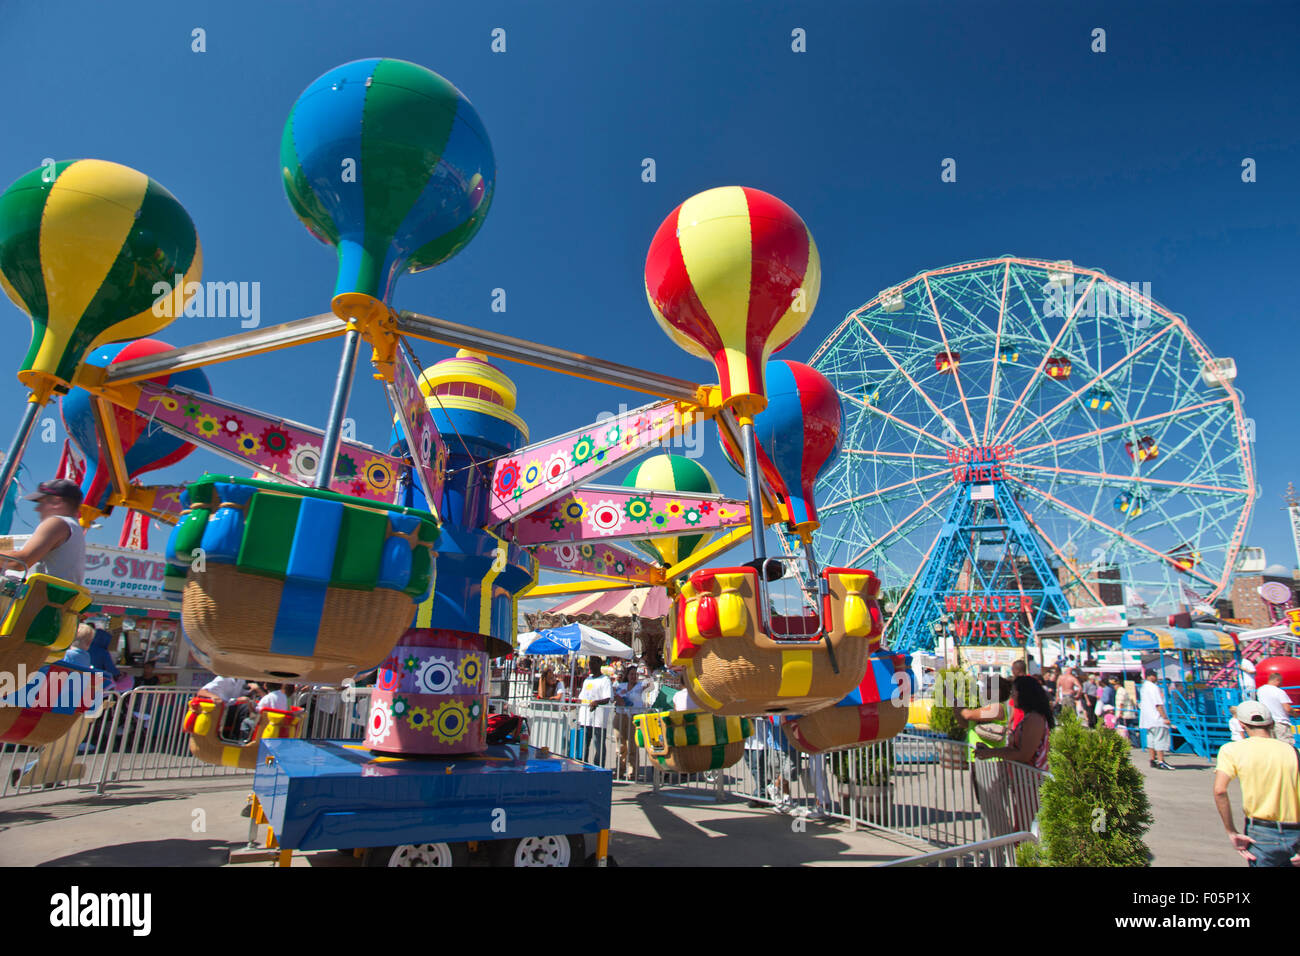 DENO'S WONDER WHEEL AMUSEMENT PARK CONEY ISLAND NEW YORK CITY USA - Stock Image